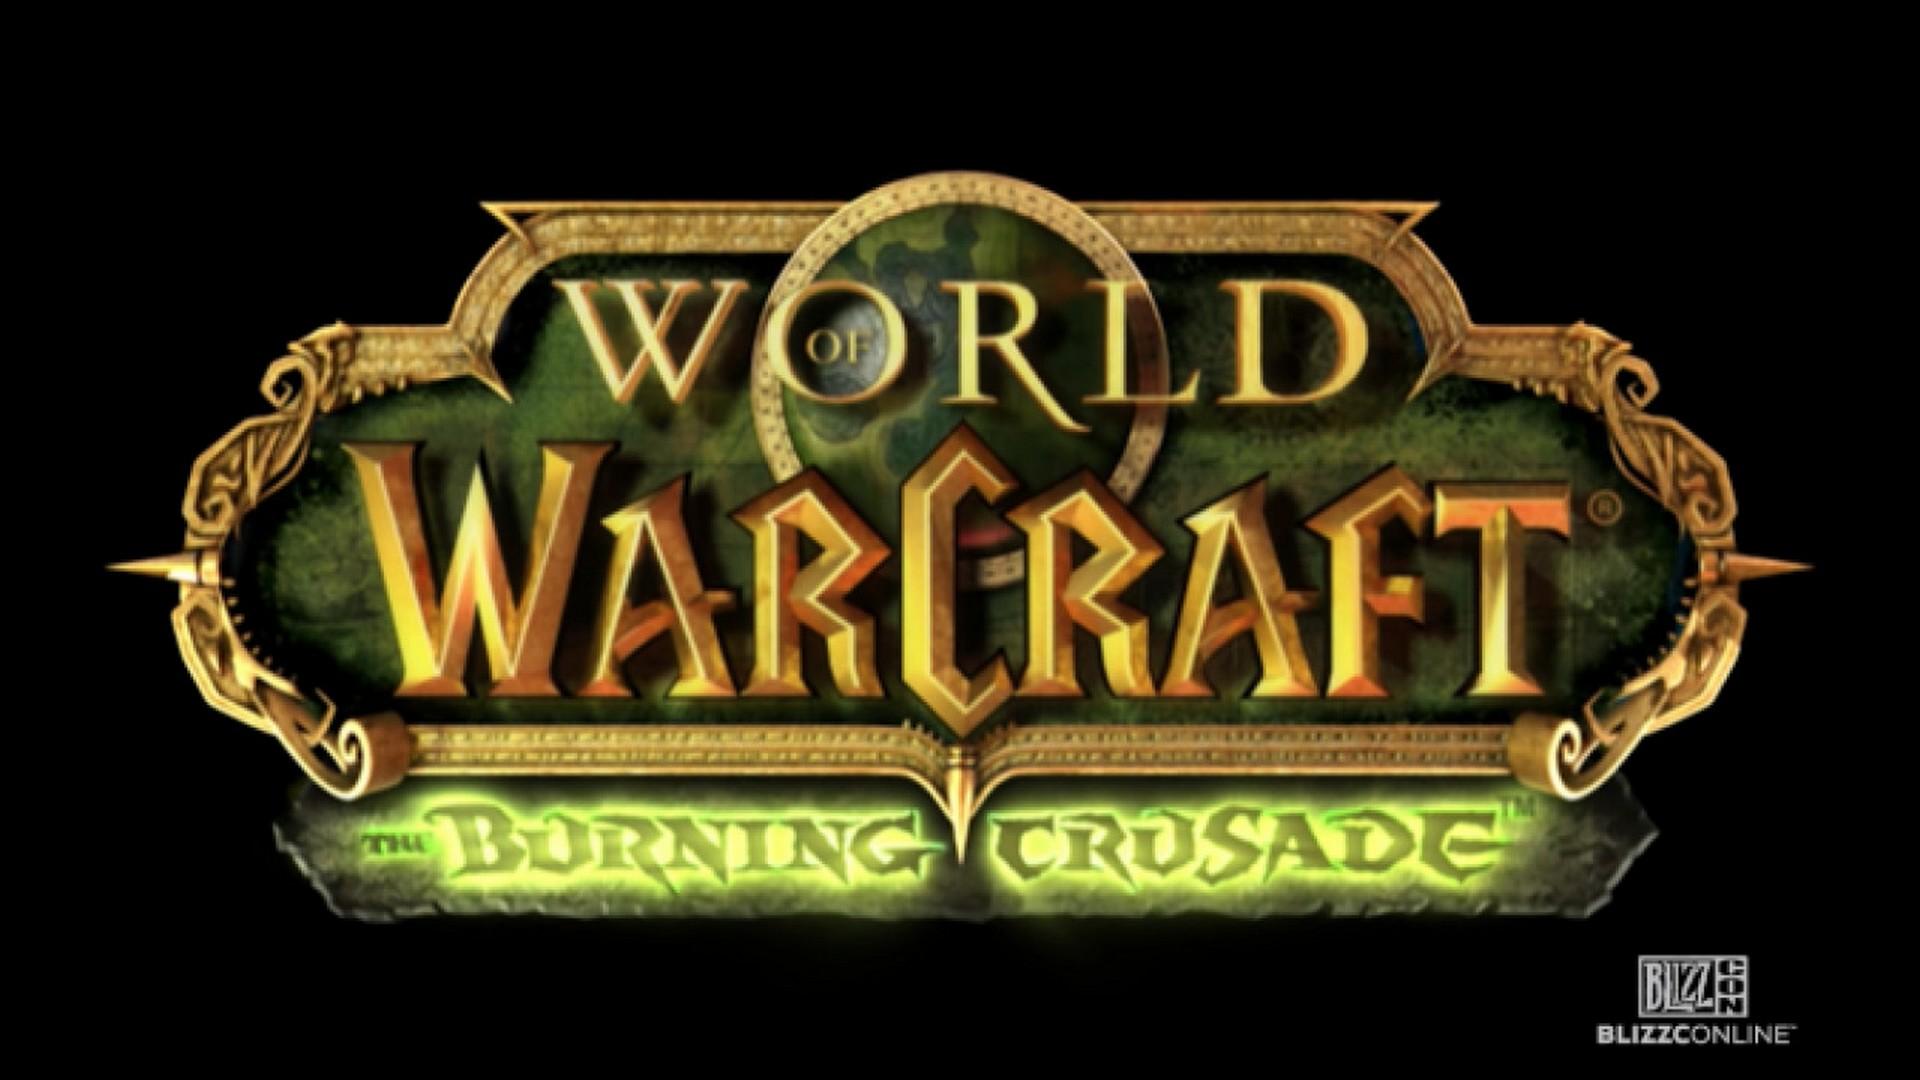 World of Warcraft - The Burning Crusade Classic